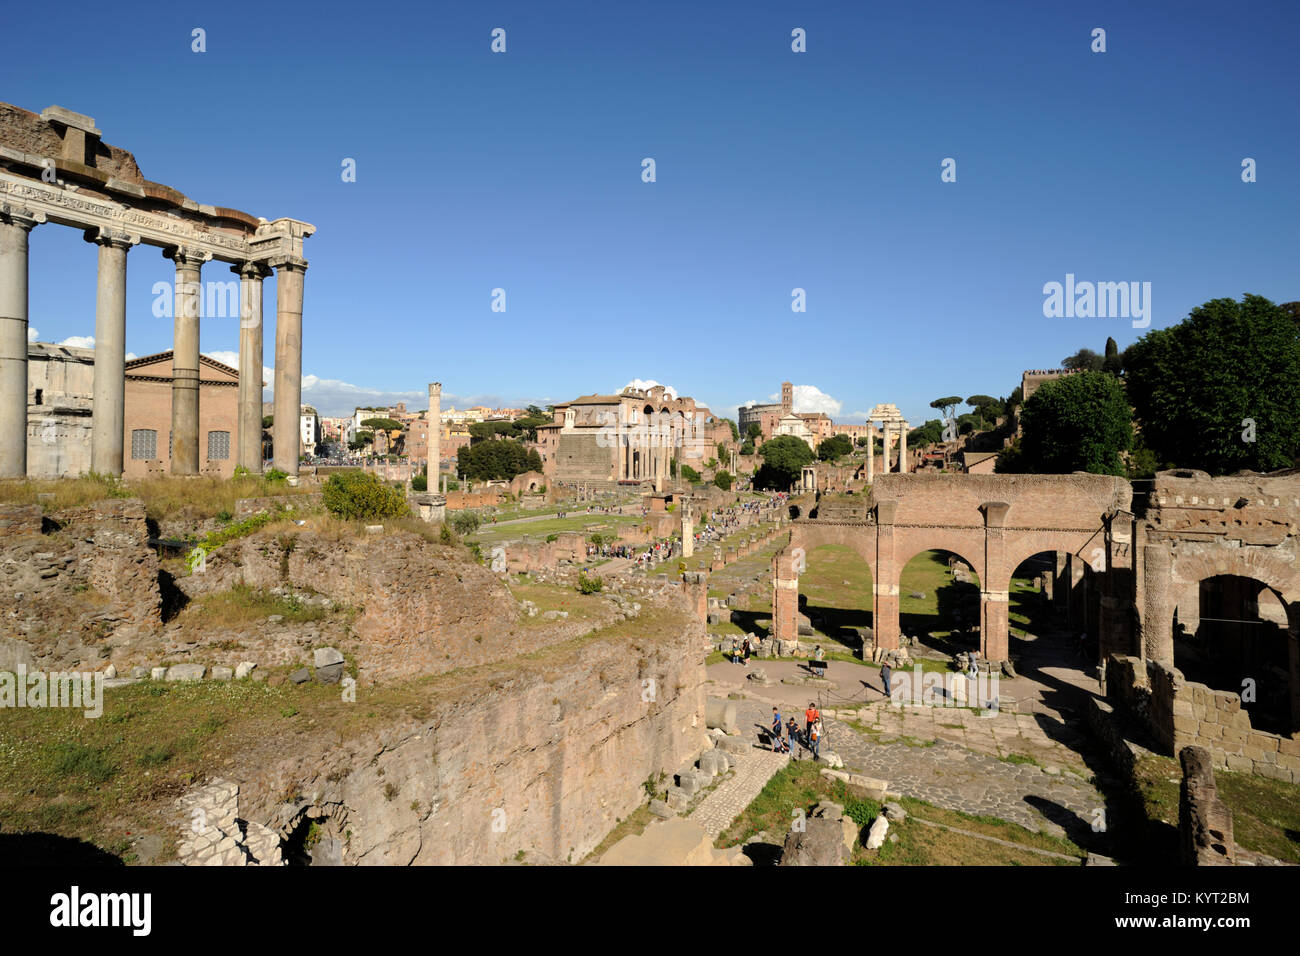 italy, rome, roman forum - Stock Image